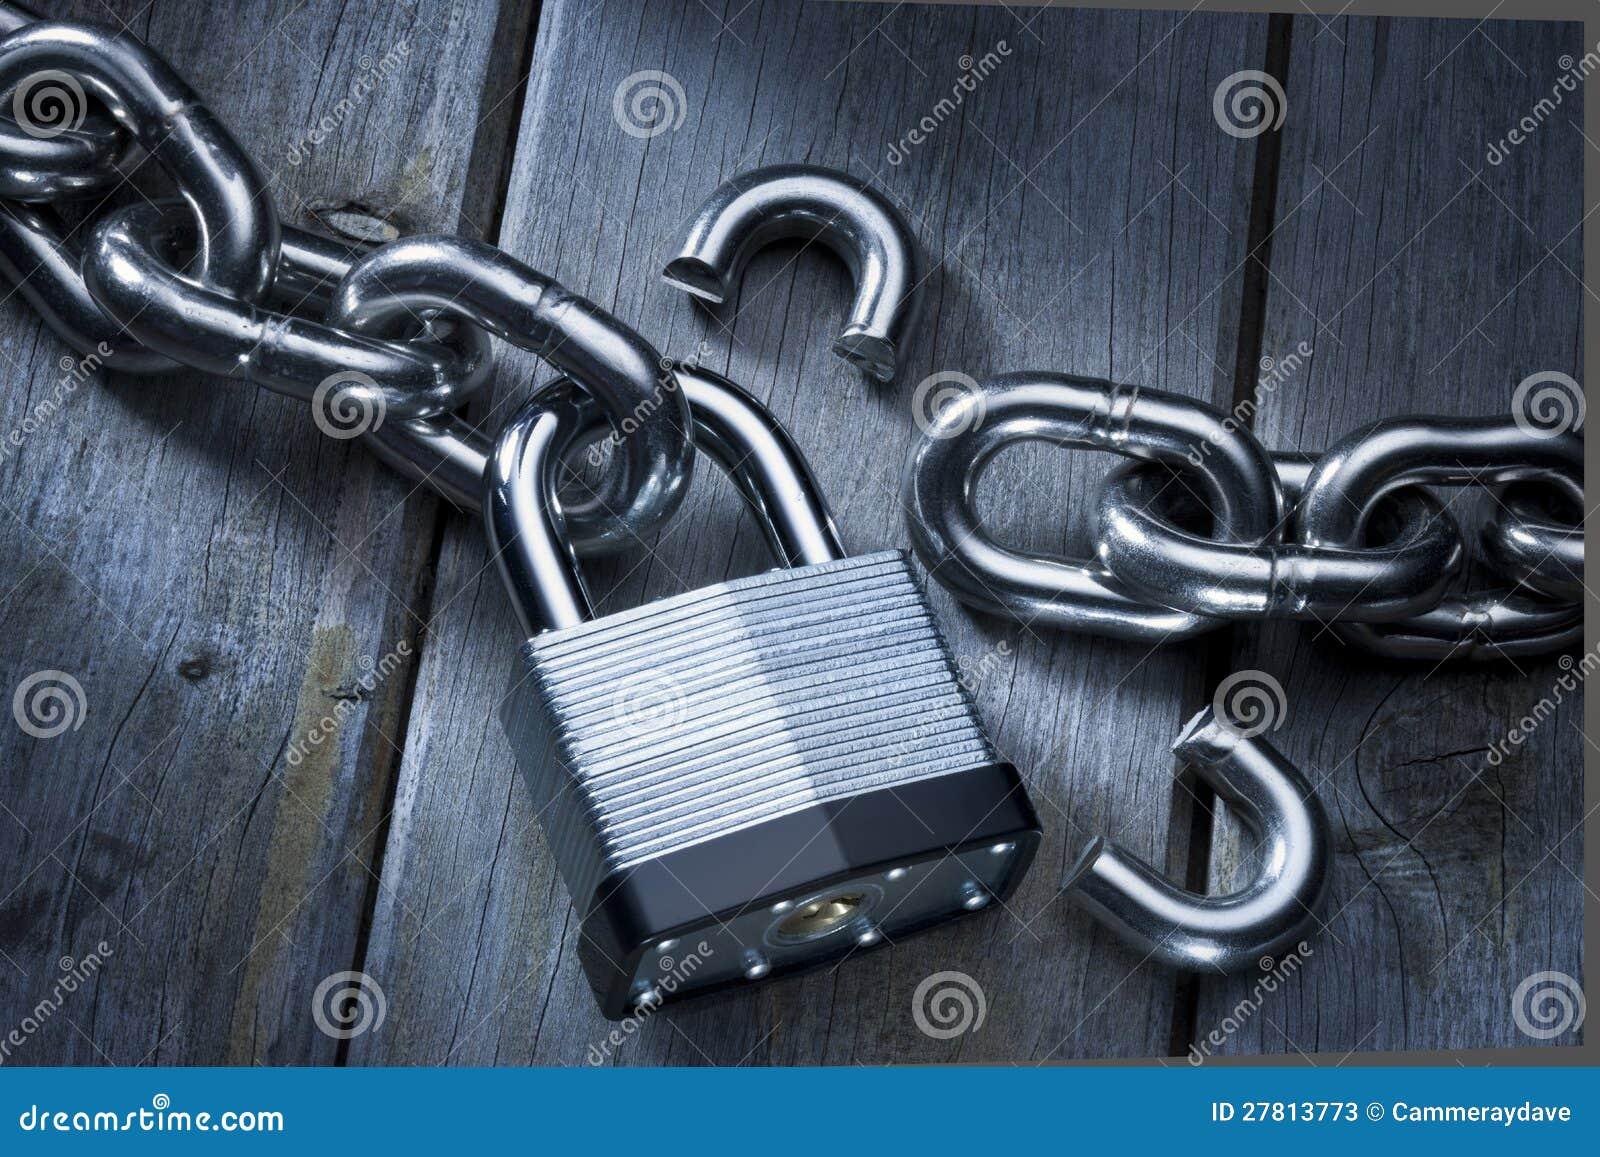 Security Lock Theft Chains Broken Stock Photos Image